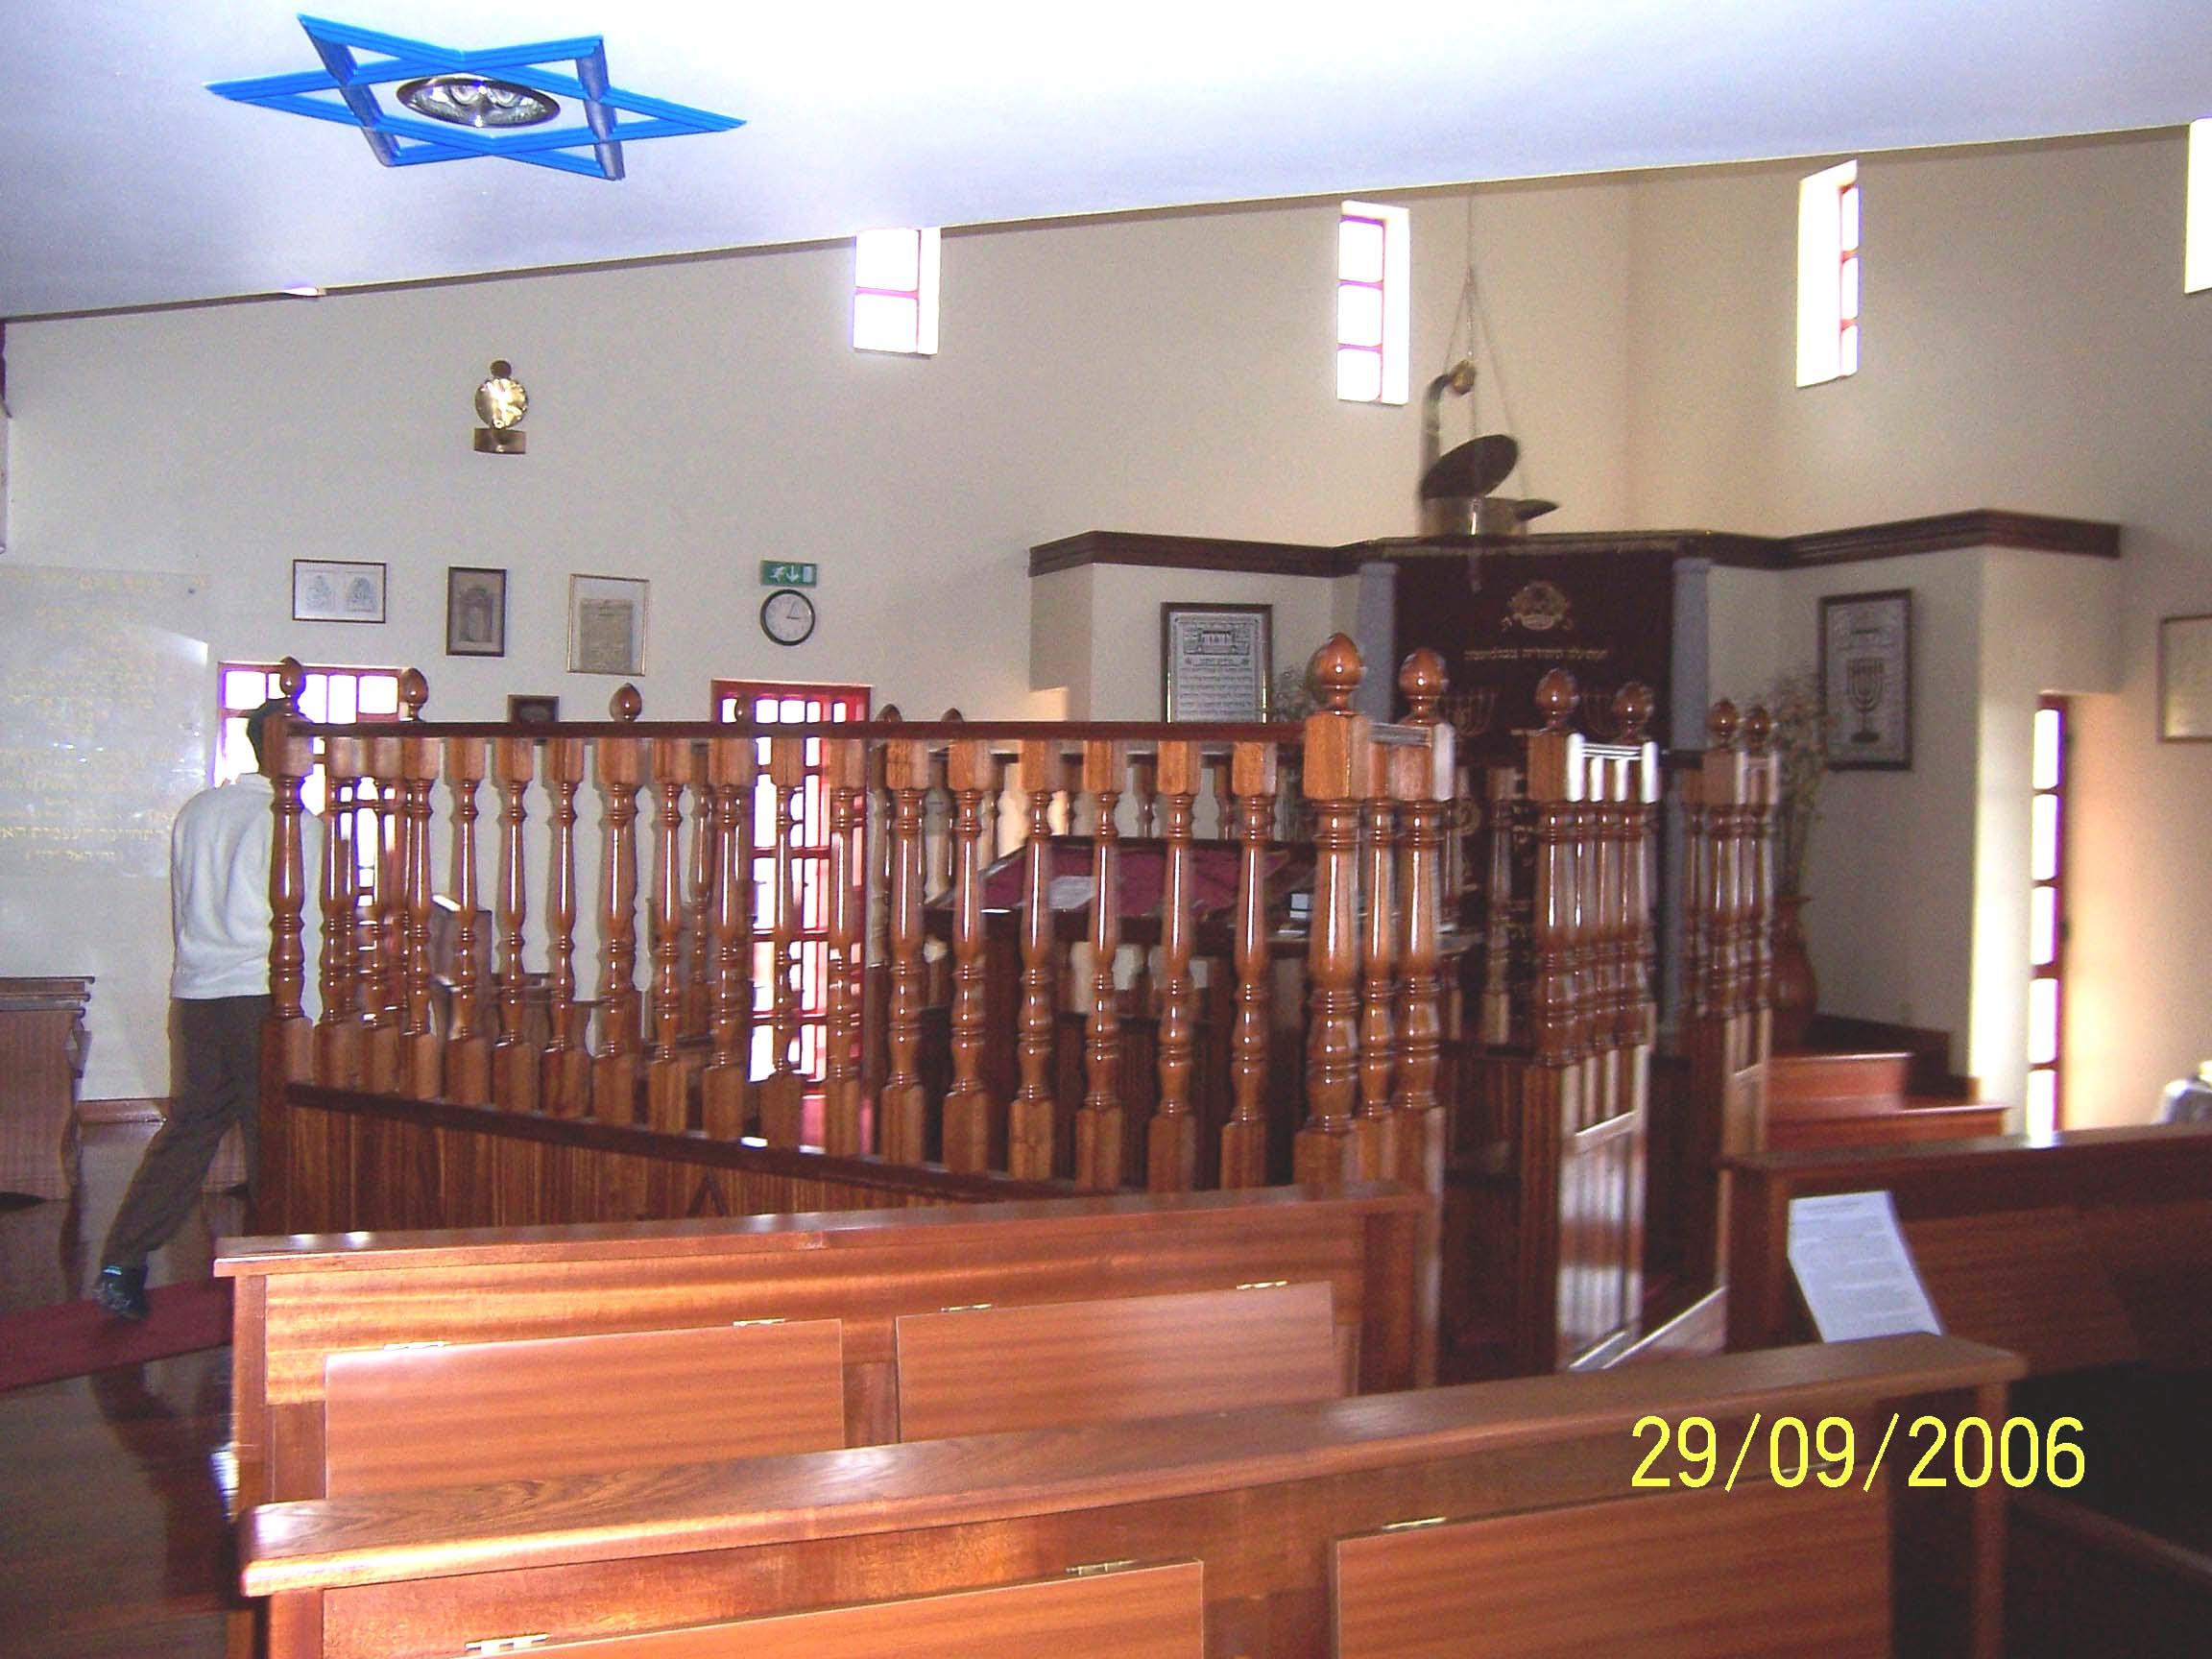 http://www.jackwhite.net/iberia/images_belmonte1/synagogue_inside1.jpg